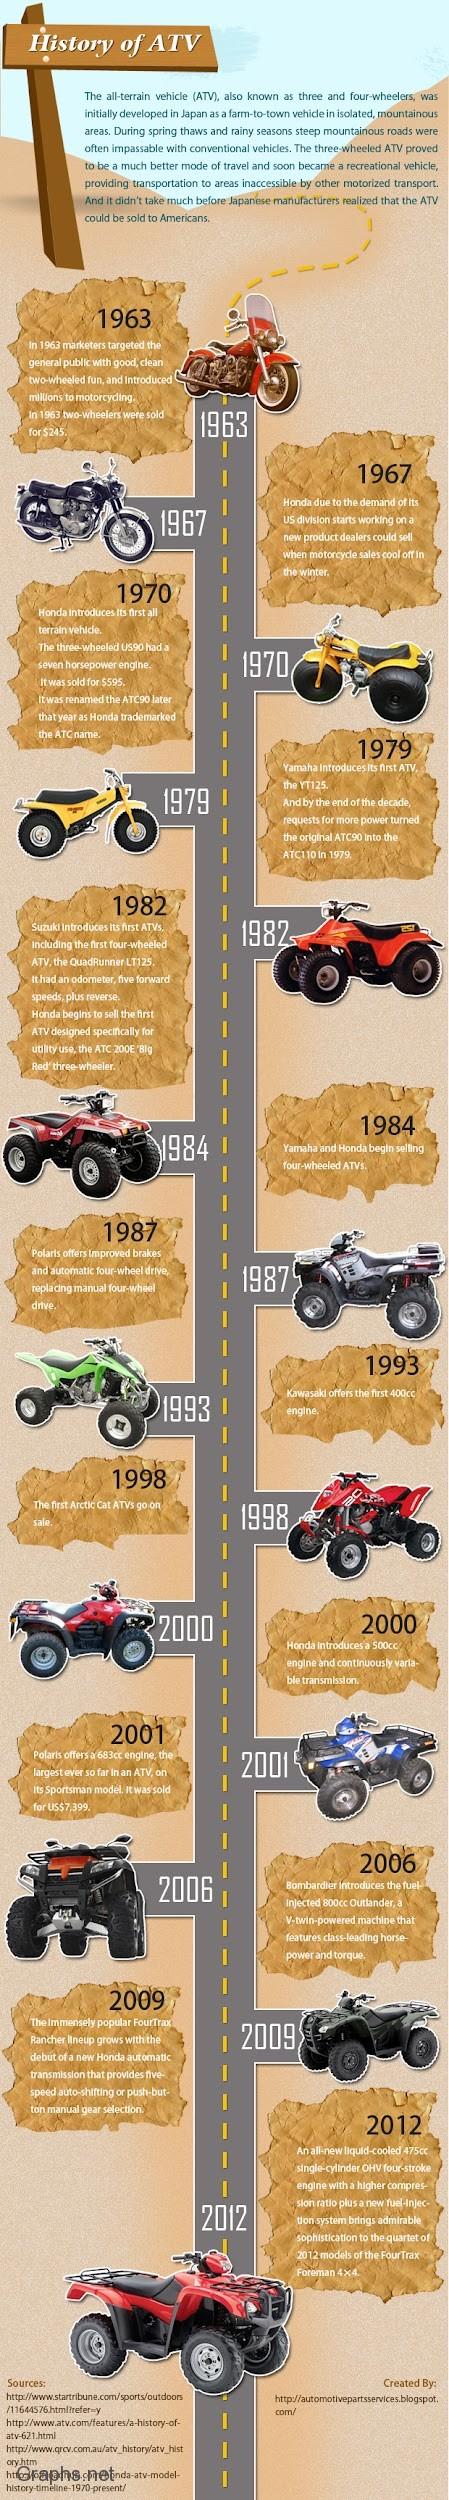 All Terrain Vehicles (ATV)